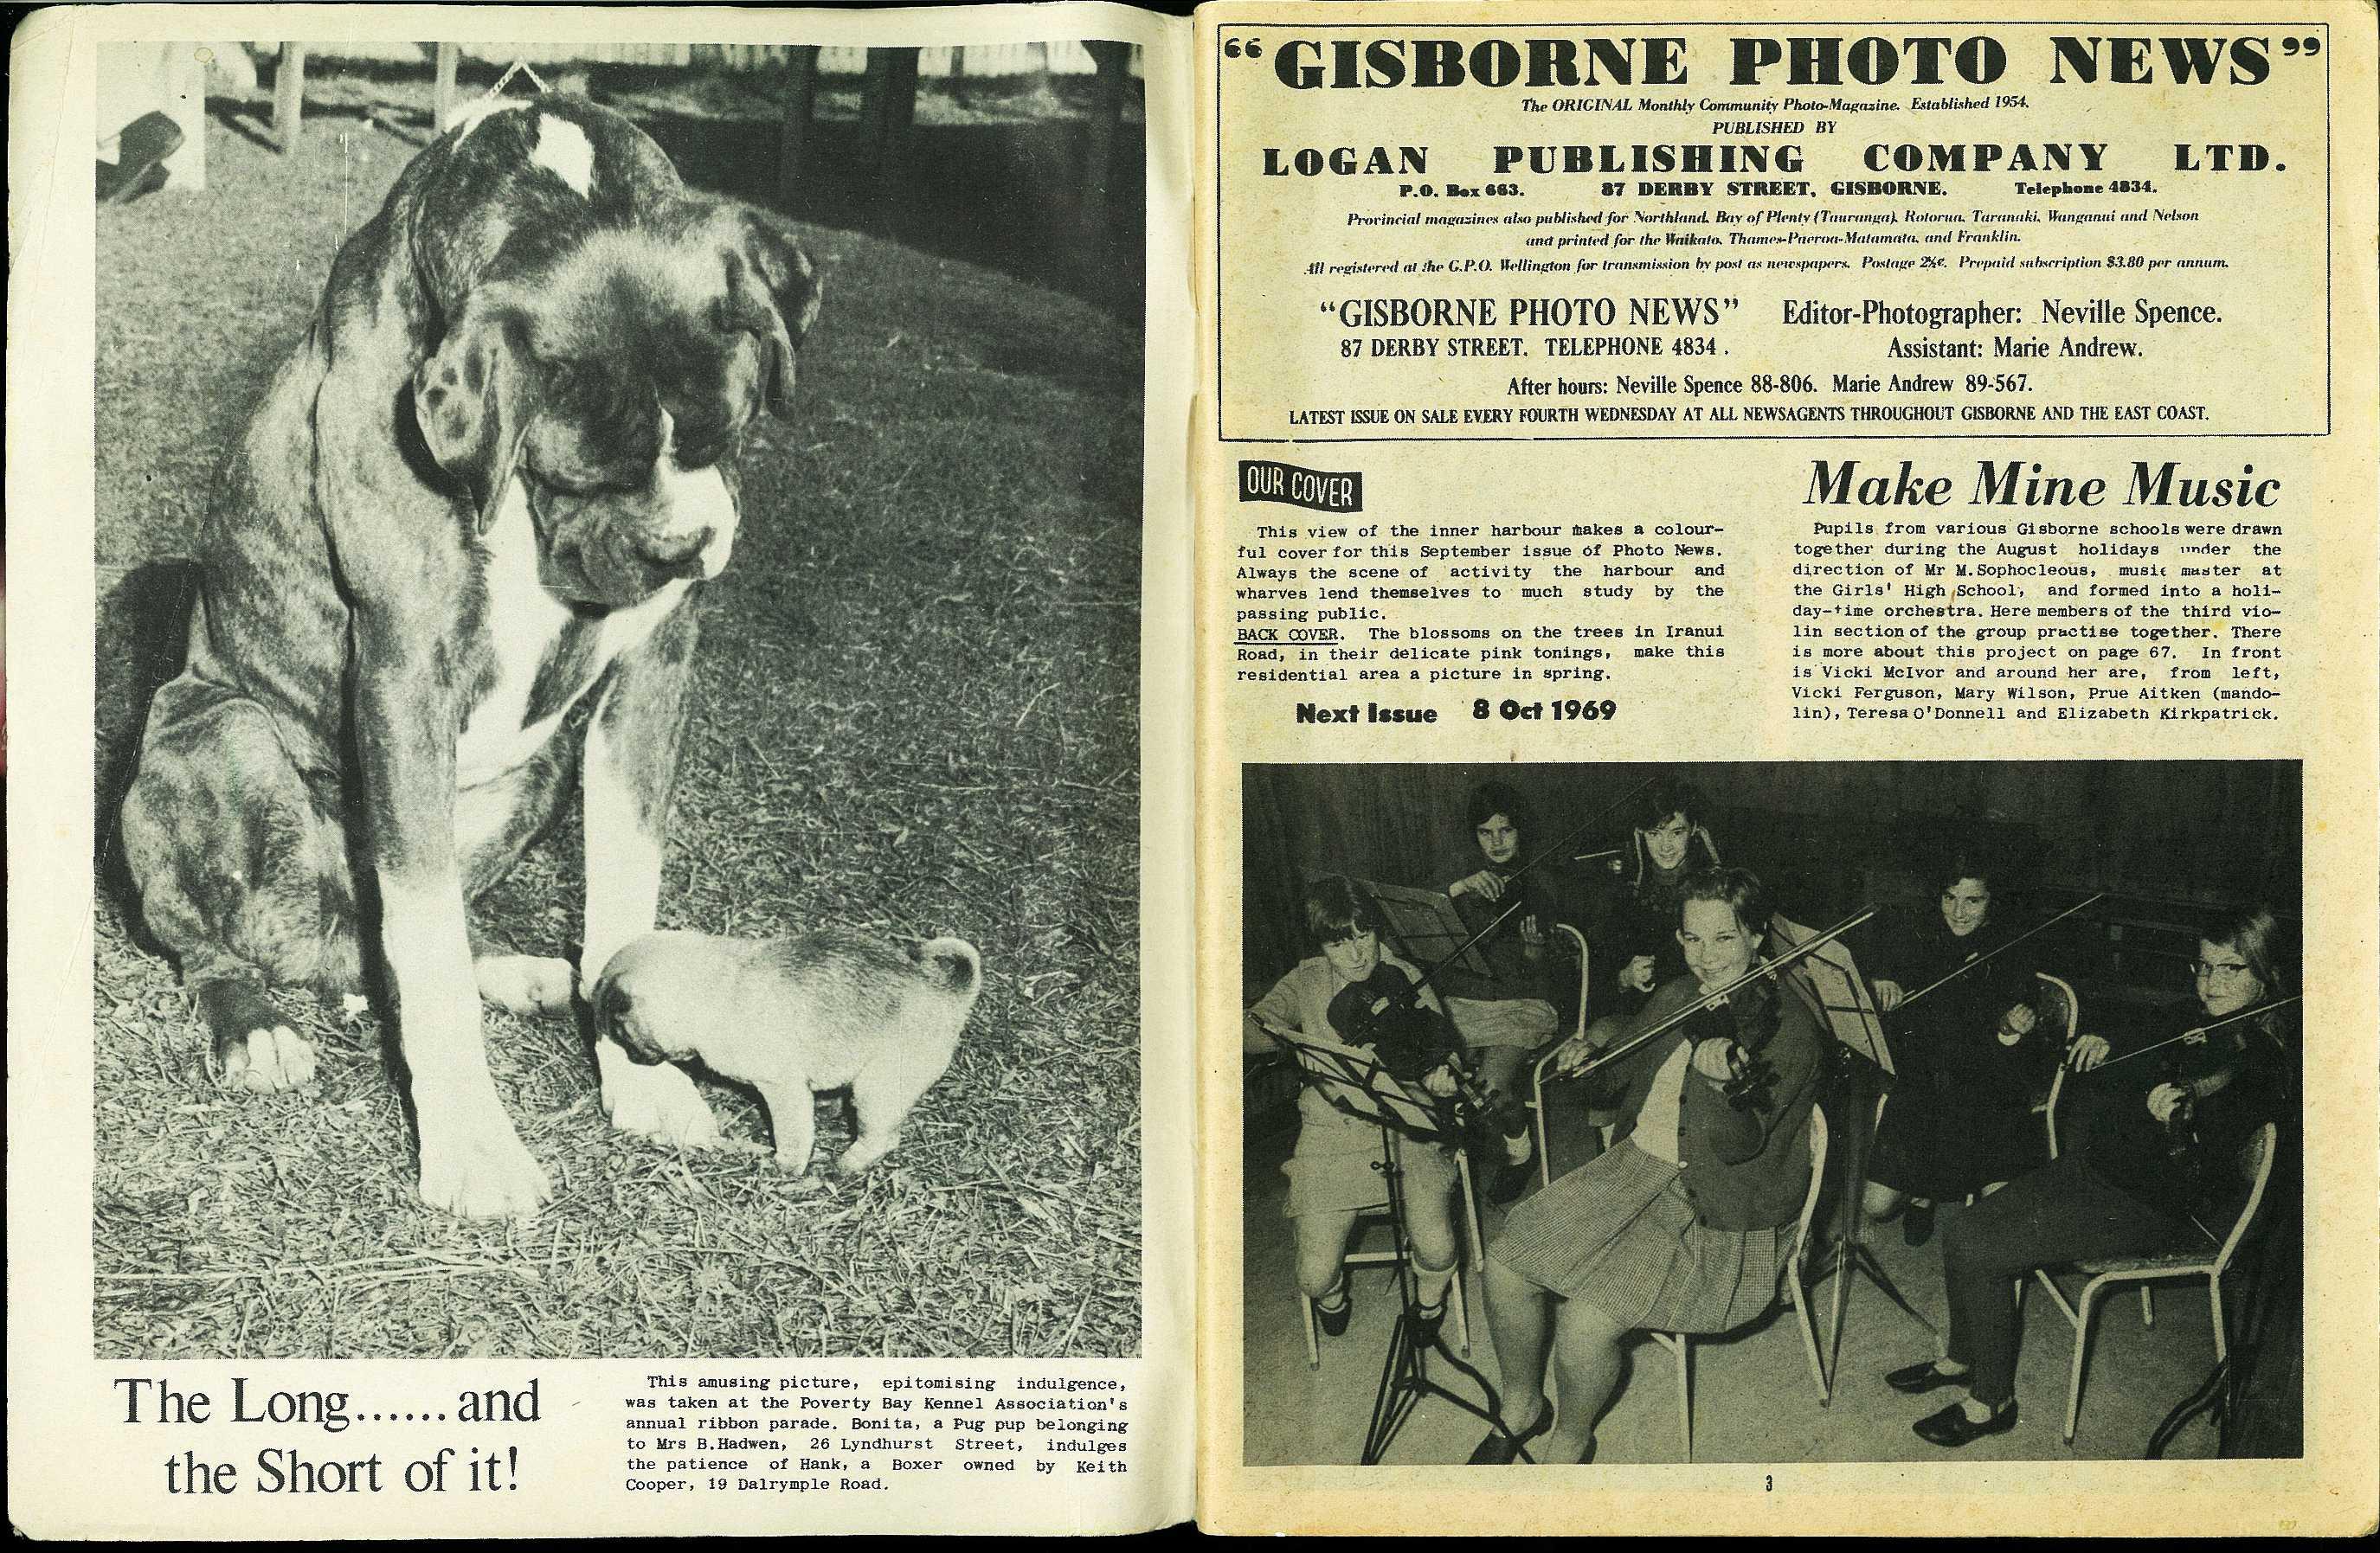 title page] - Gisborne Photo News - No 183 : September 10, 1969